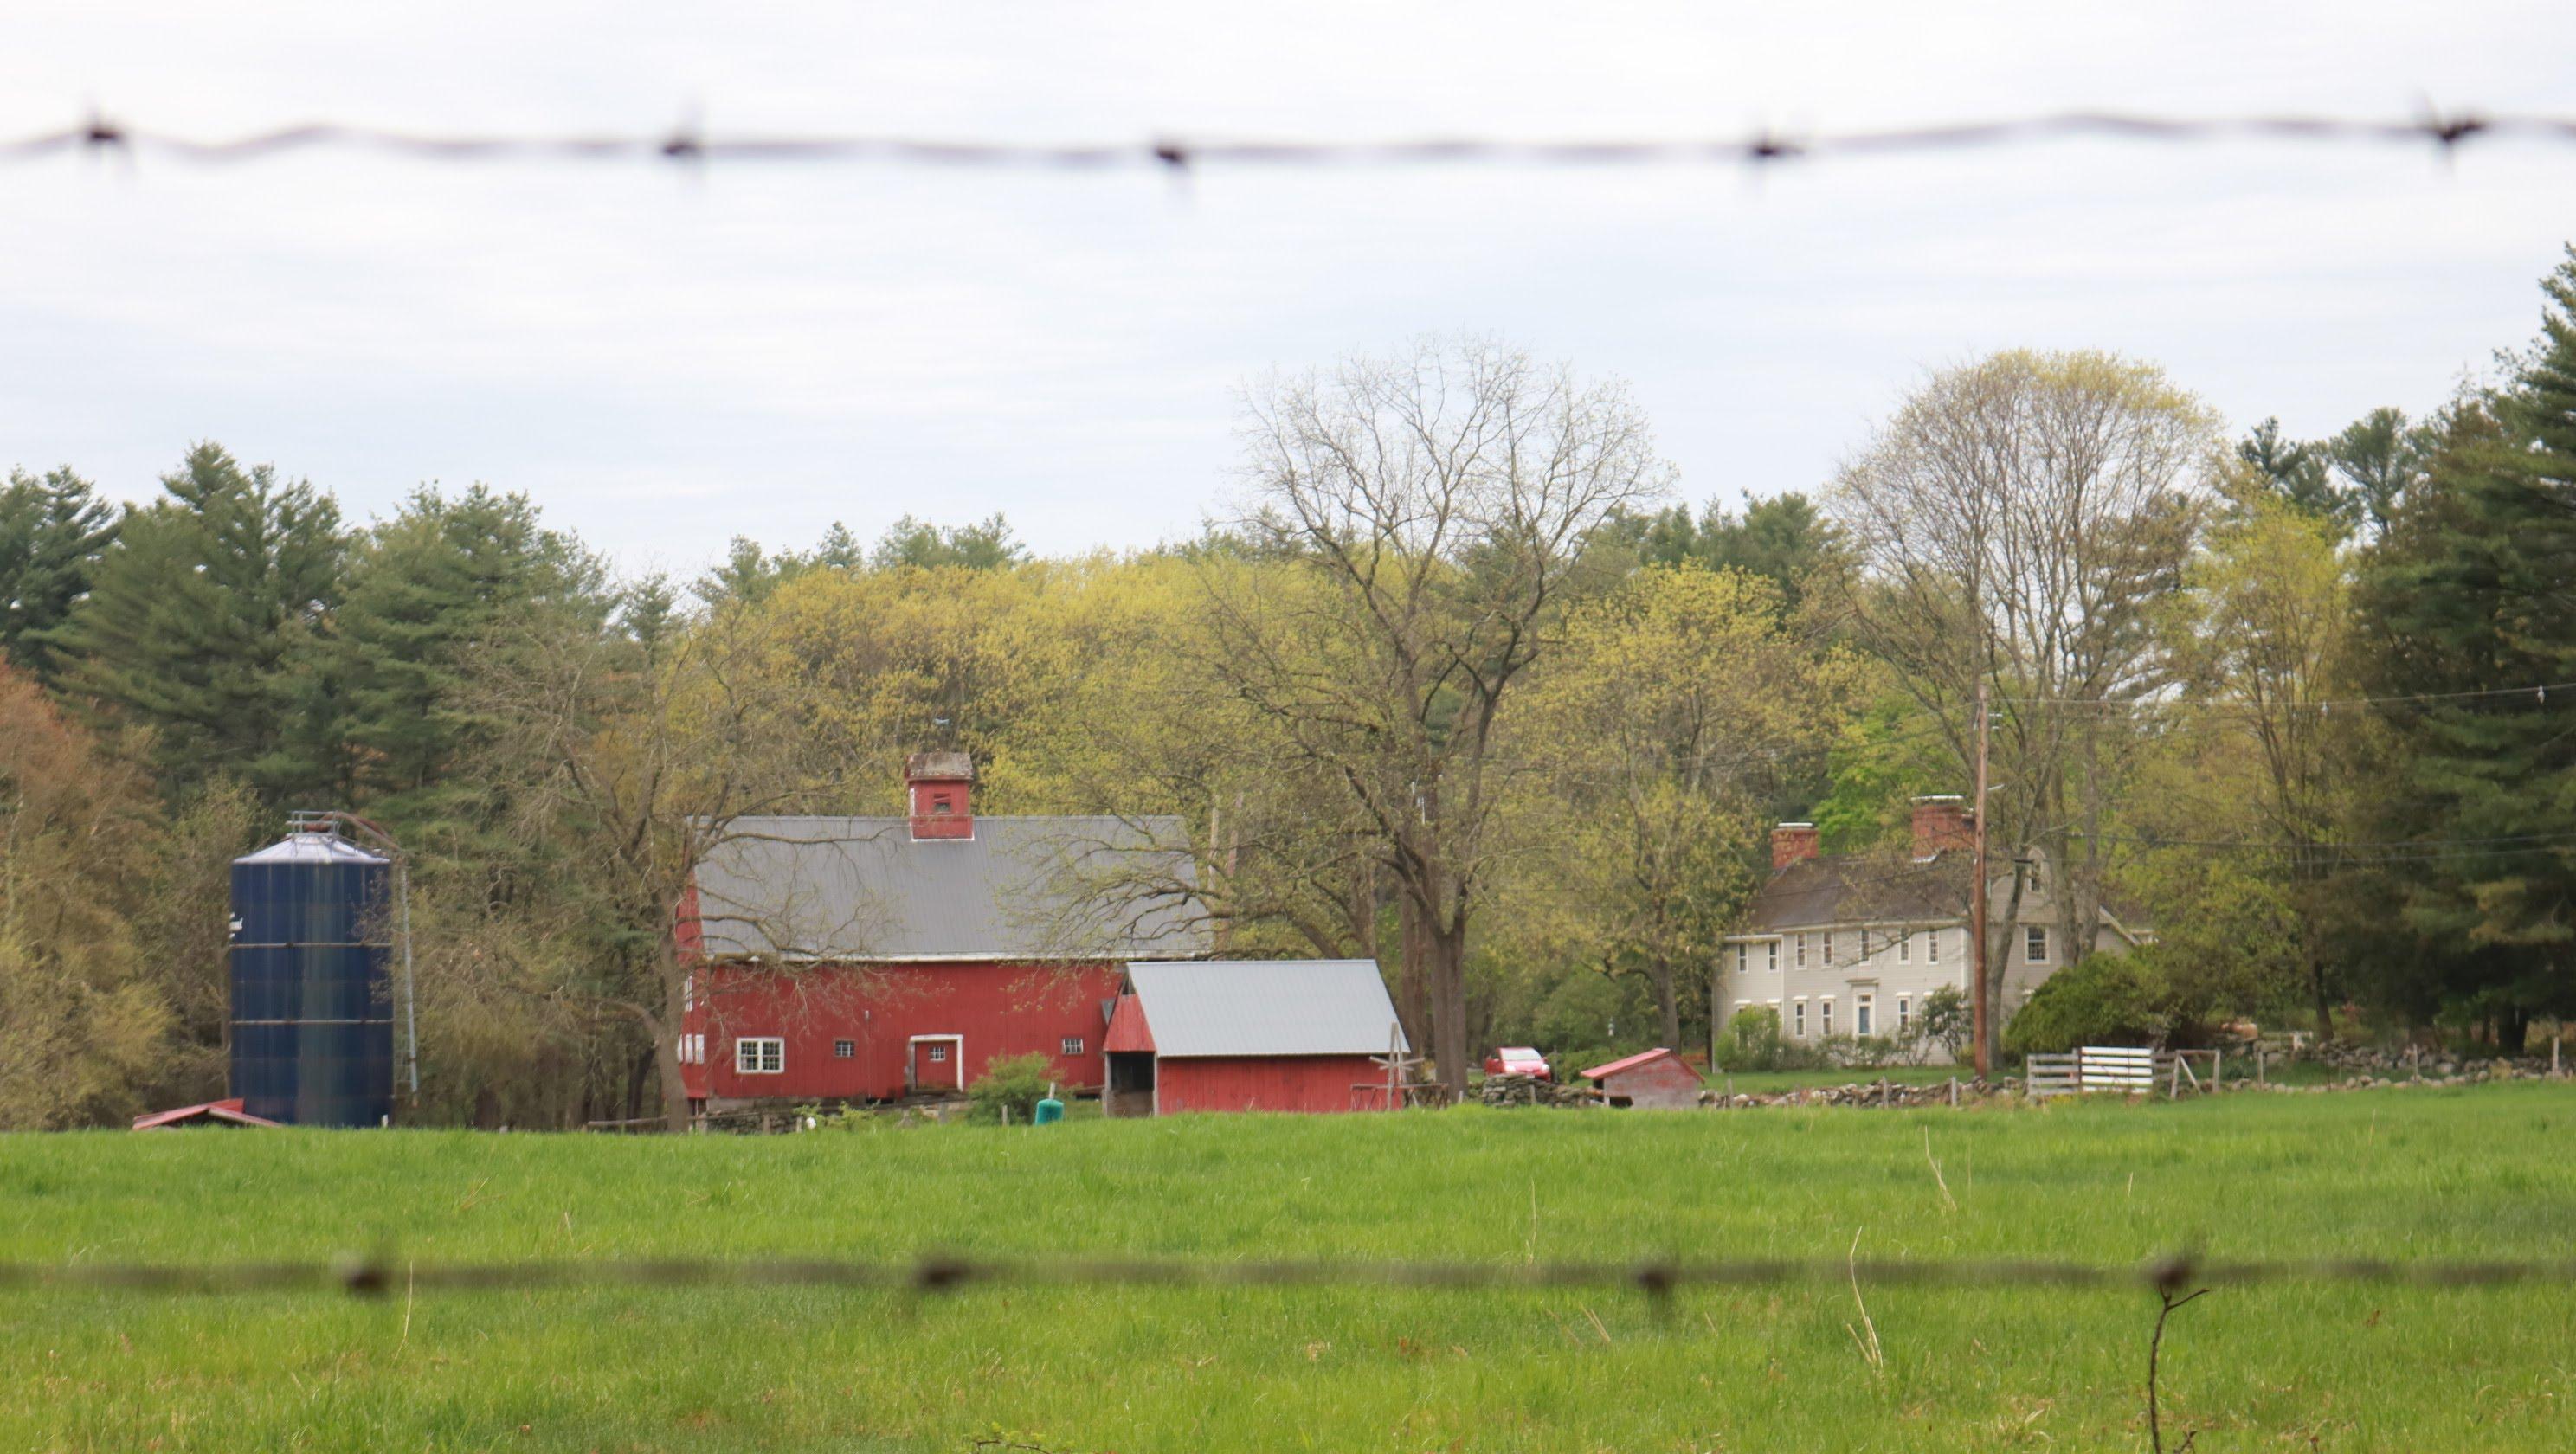 A farm in Carlisle, Massachusetts.